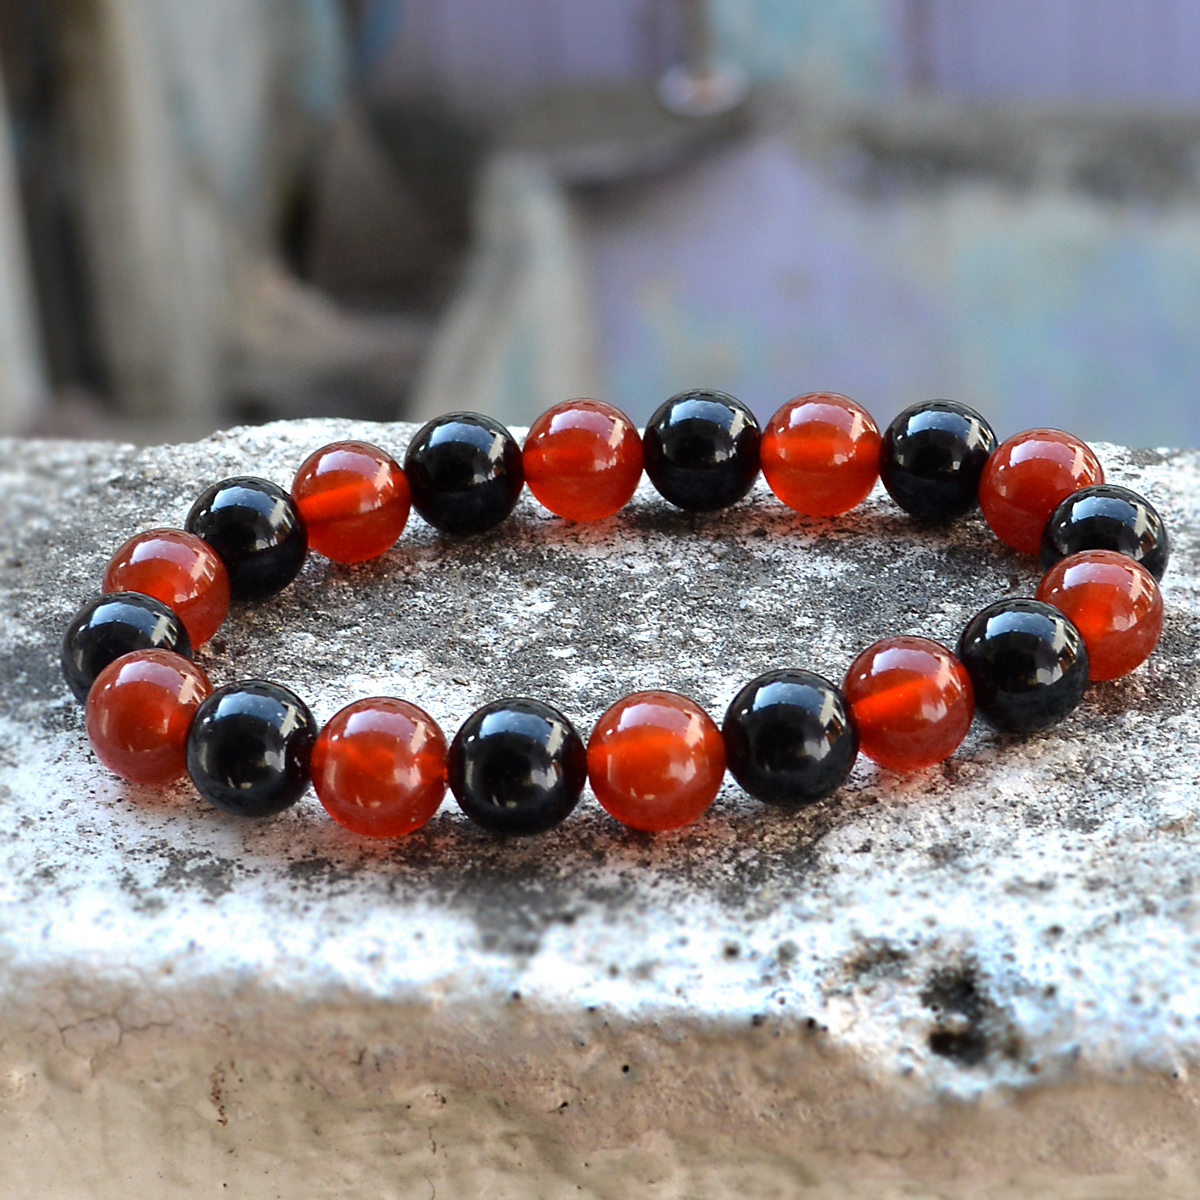 Black & Red Onyx Bead Bracelet PG-156001